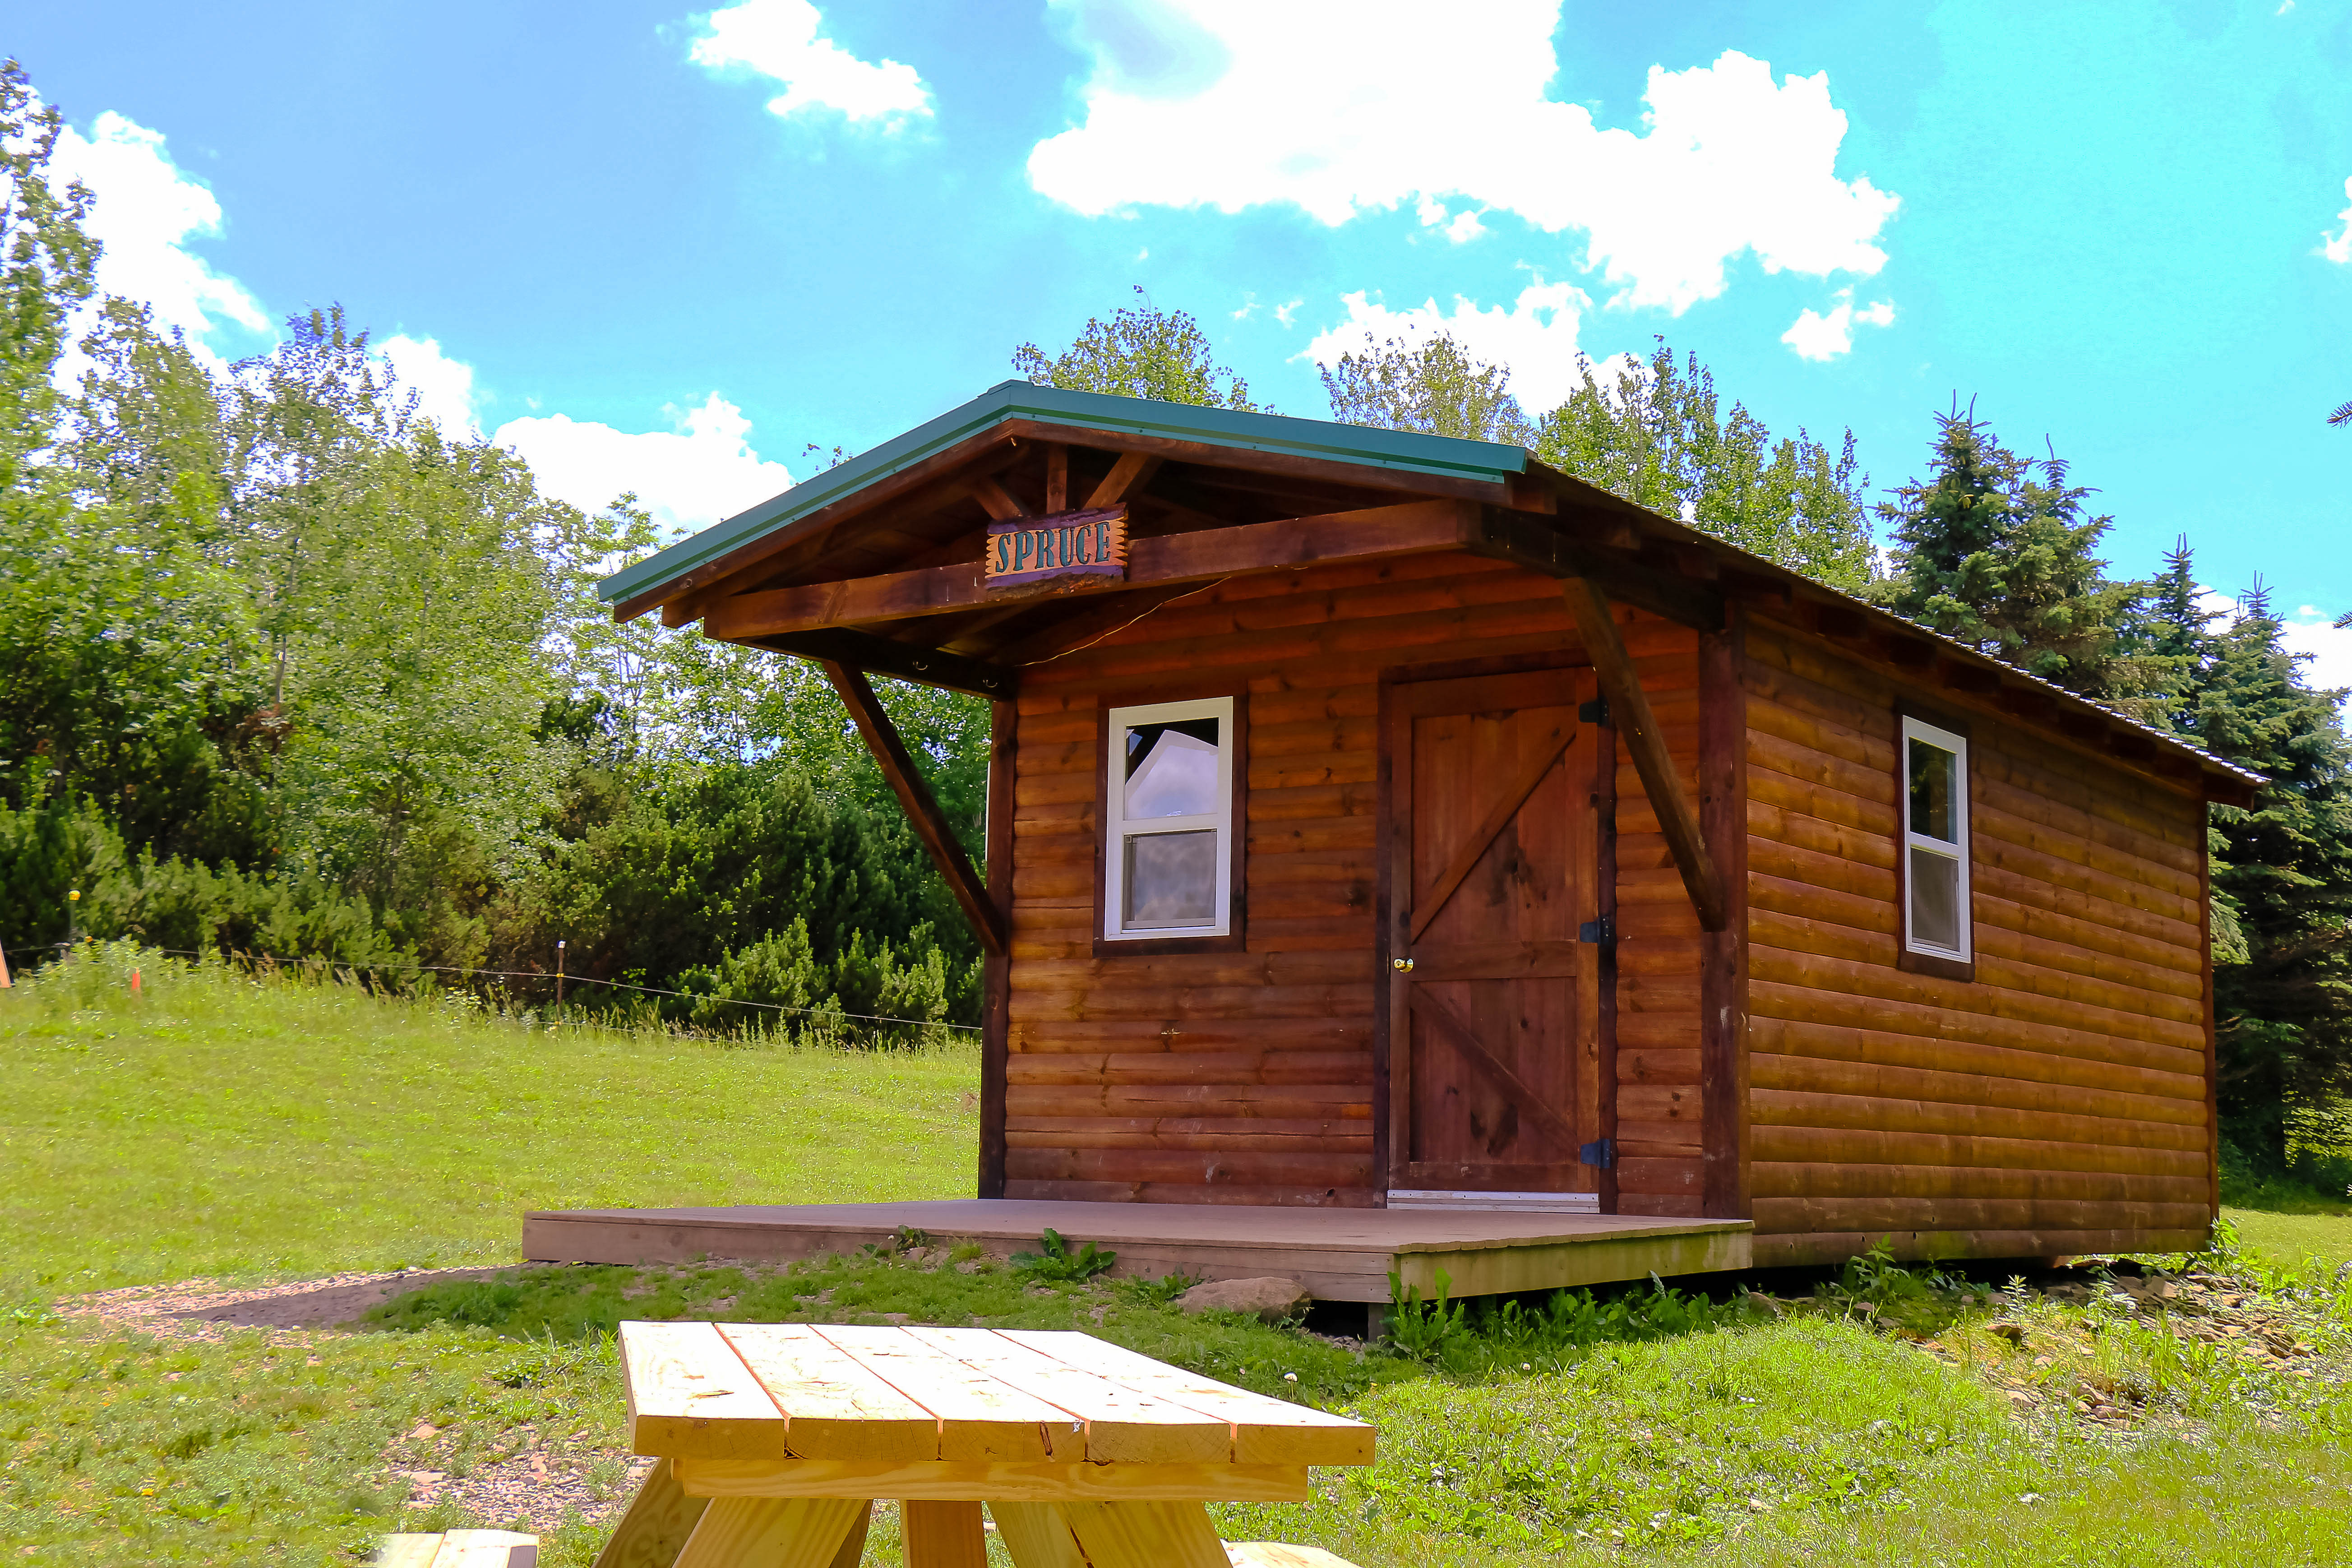 Spruce Cabin Tall Pines Atv Park